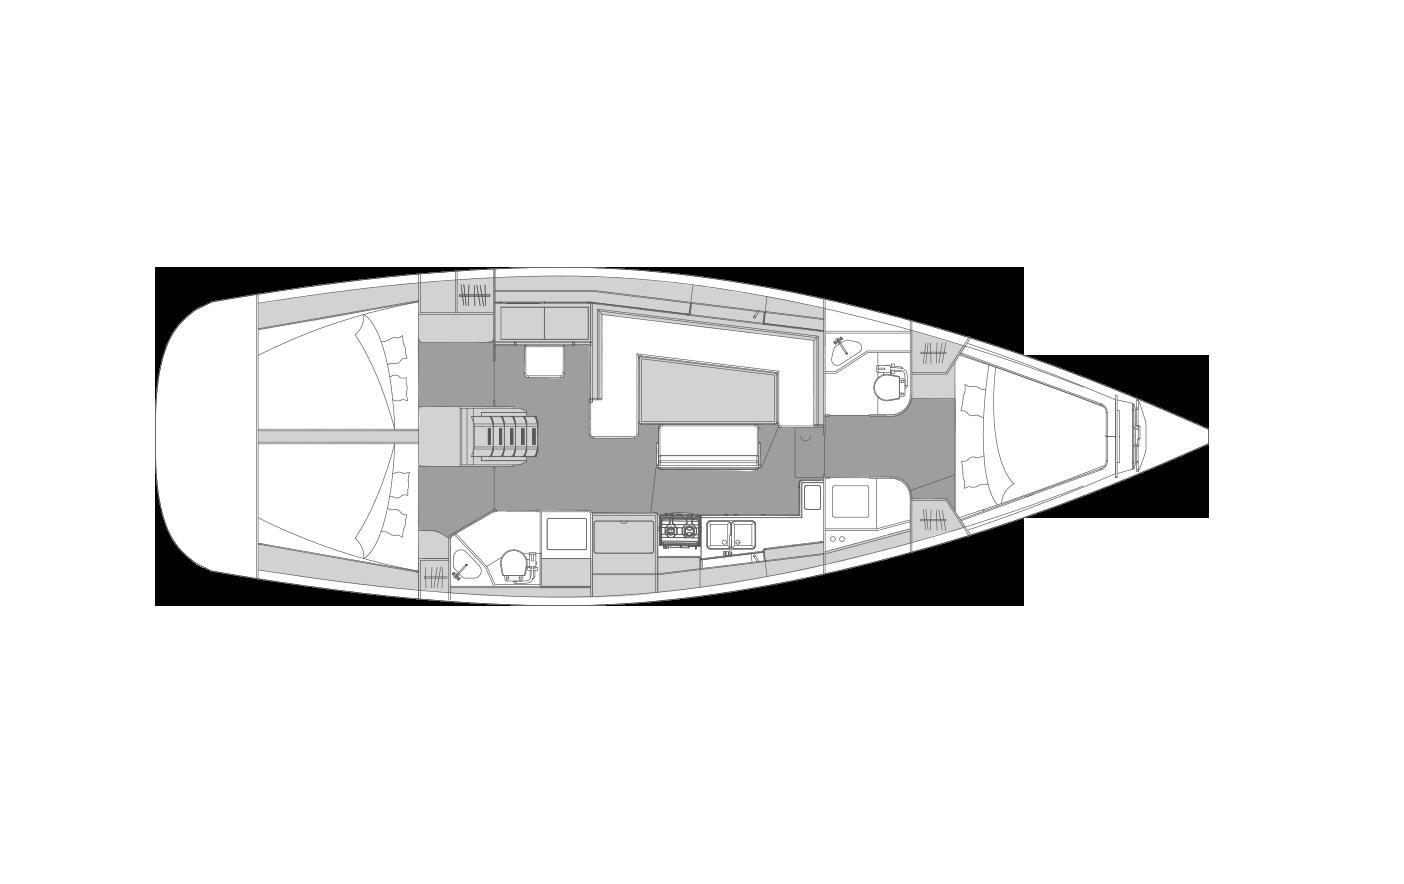 i45 - 3 cabins & 2 heads